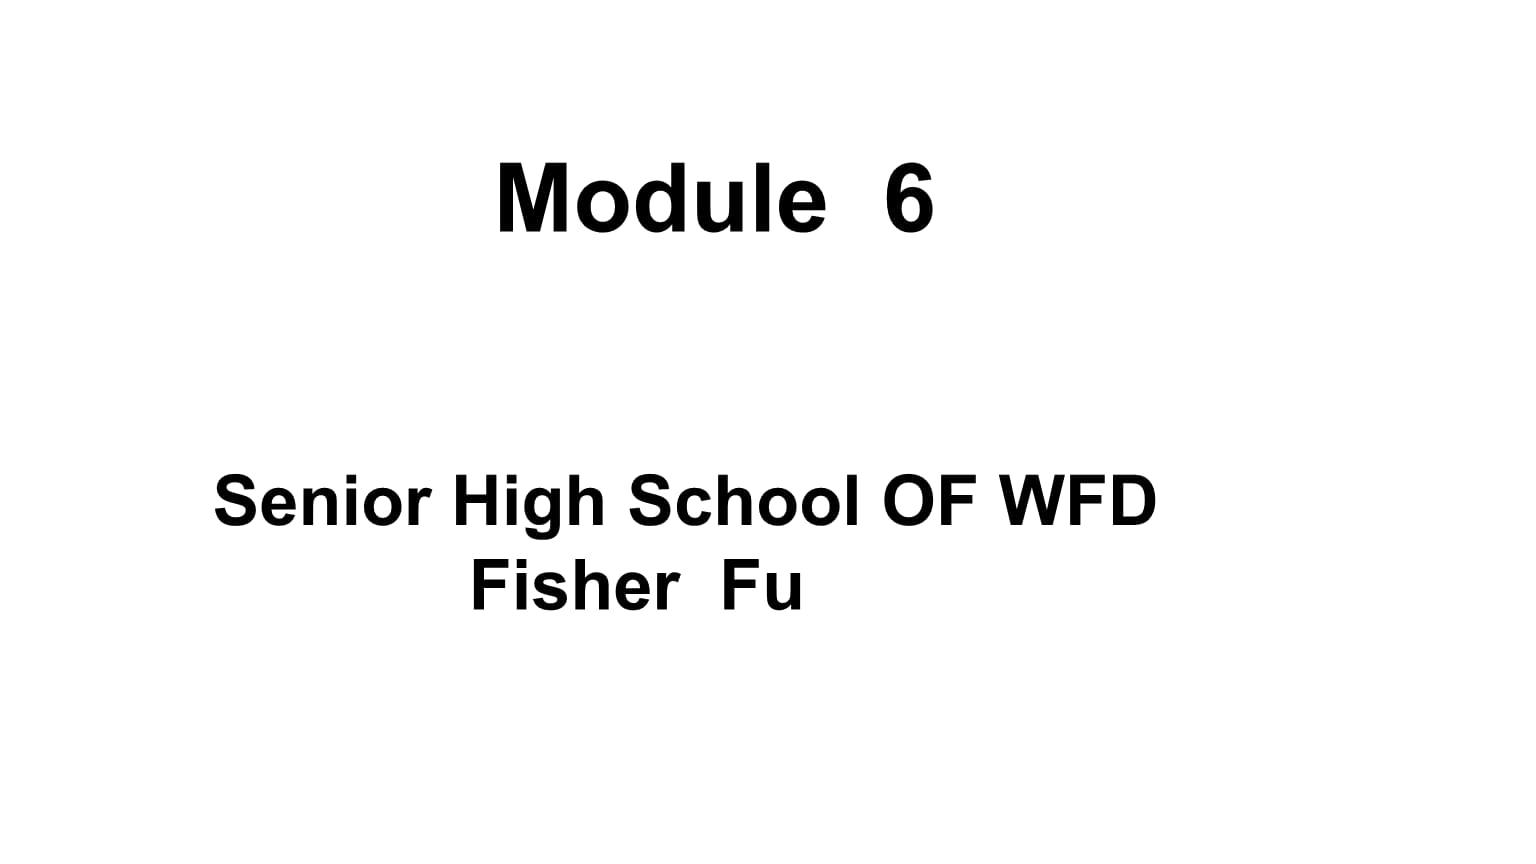 外研社英语必修一《Module 6 Senior High School OF WFD Fisher Fu》课件.pptx